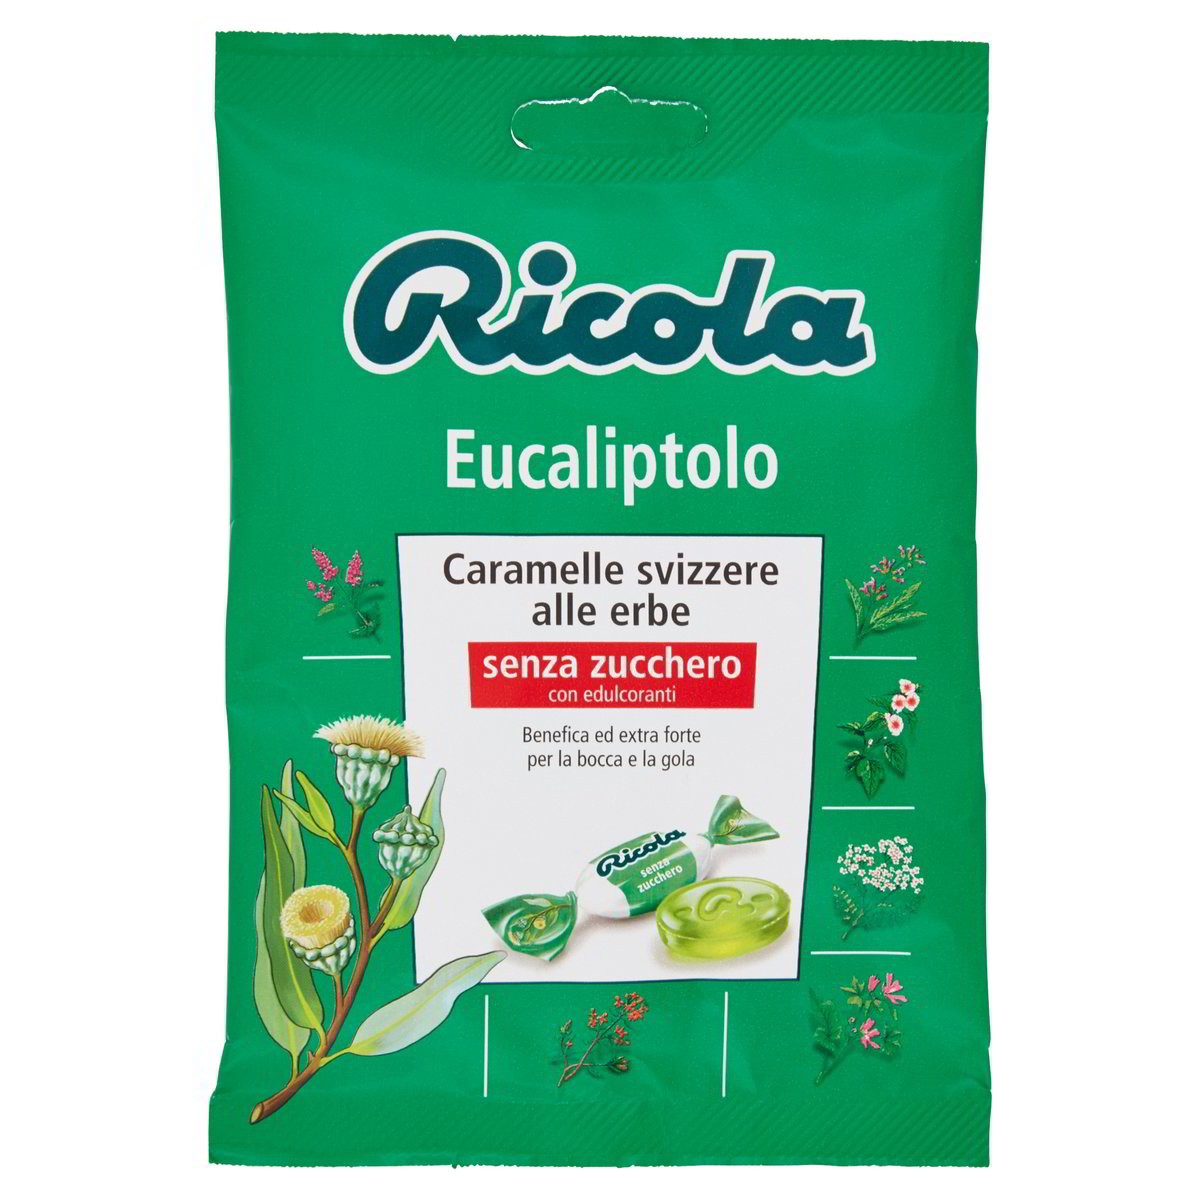 Caramelle Svizzere Eucaliptolo